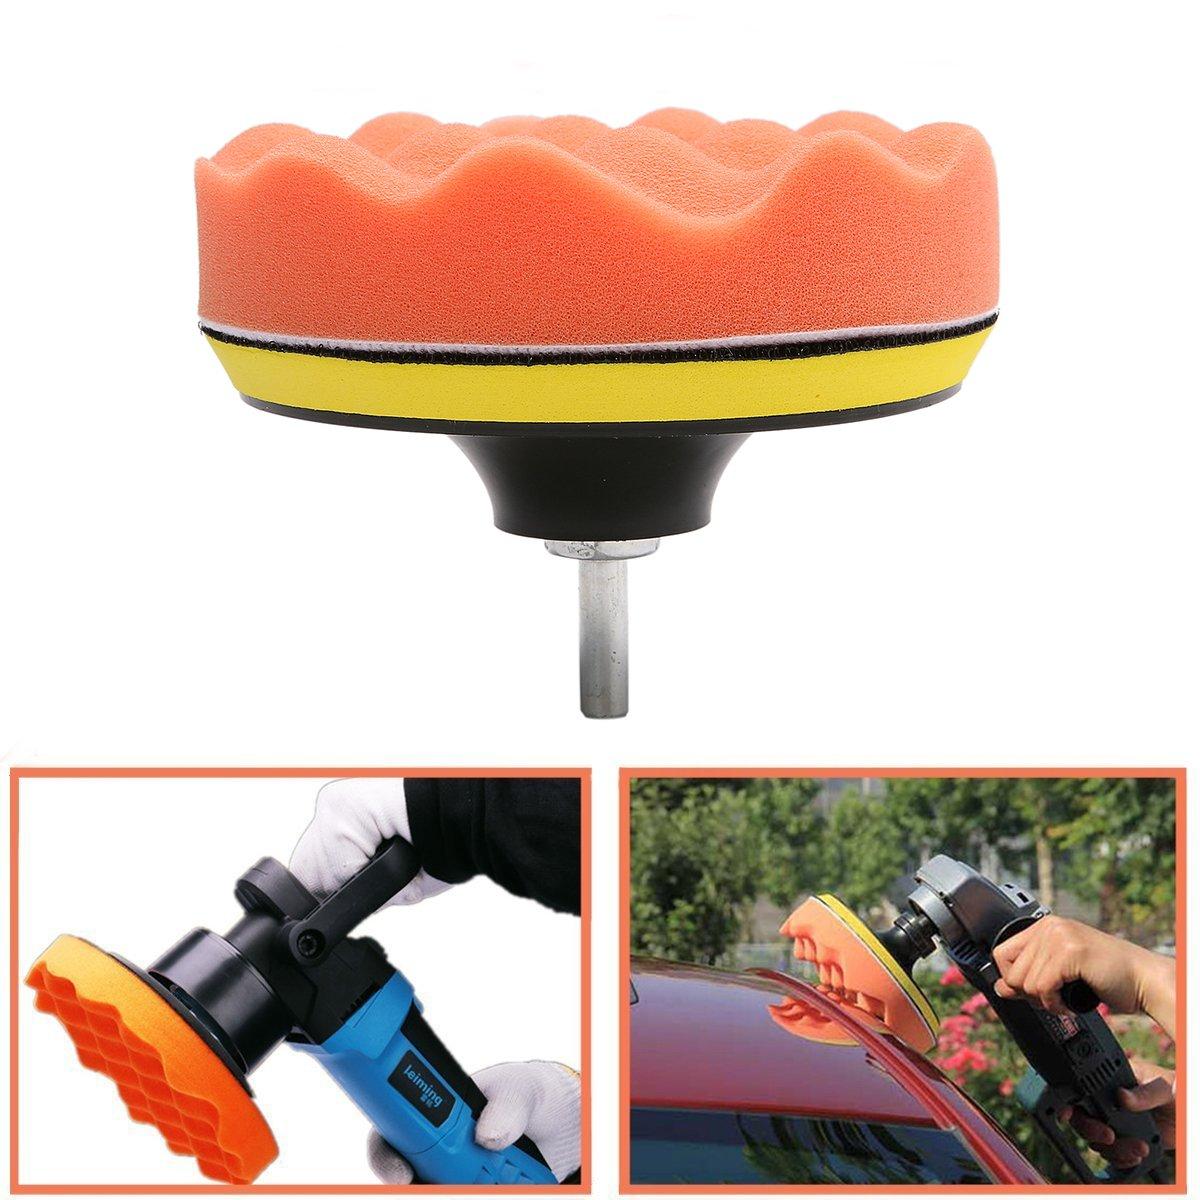 MATCC 7Pcs 6inch Polishing pads,Sponge and Woolen Polishing Waxing Buffing Pads Kits with M14 Drill Adapter, 6inchs by MATCC (Image #5)